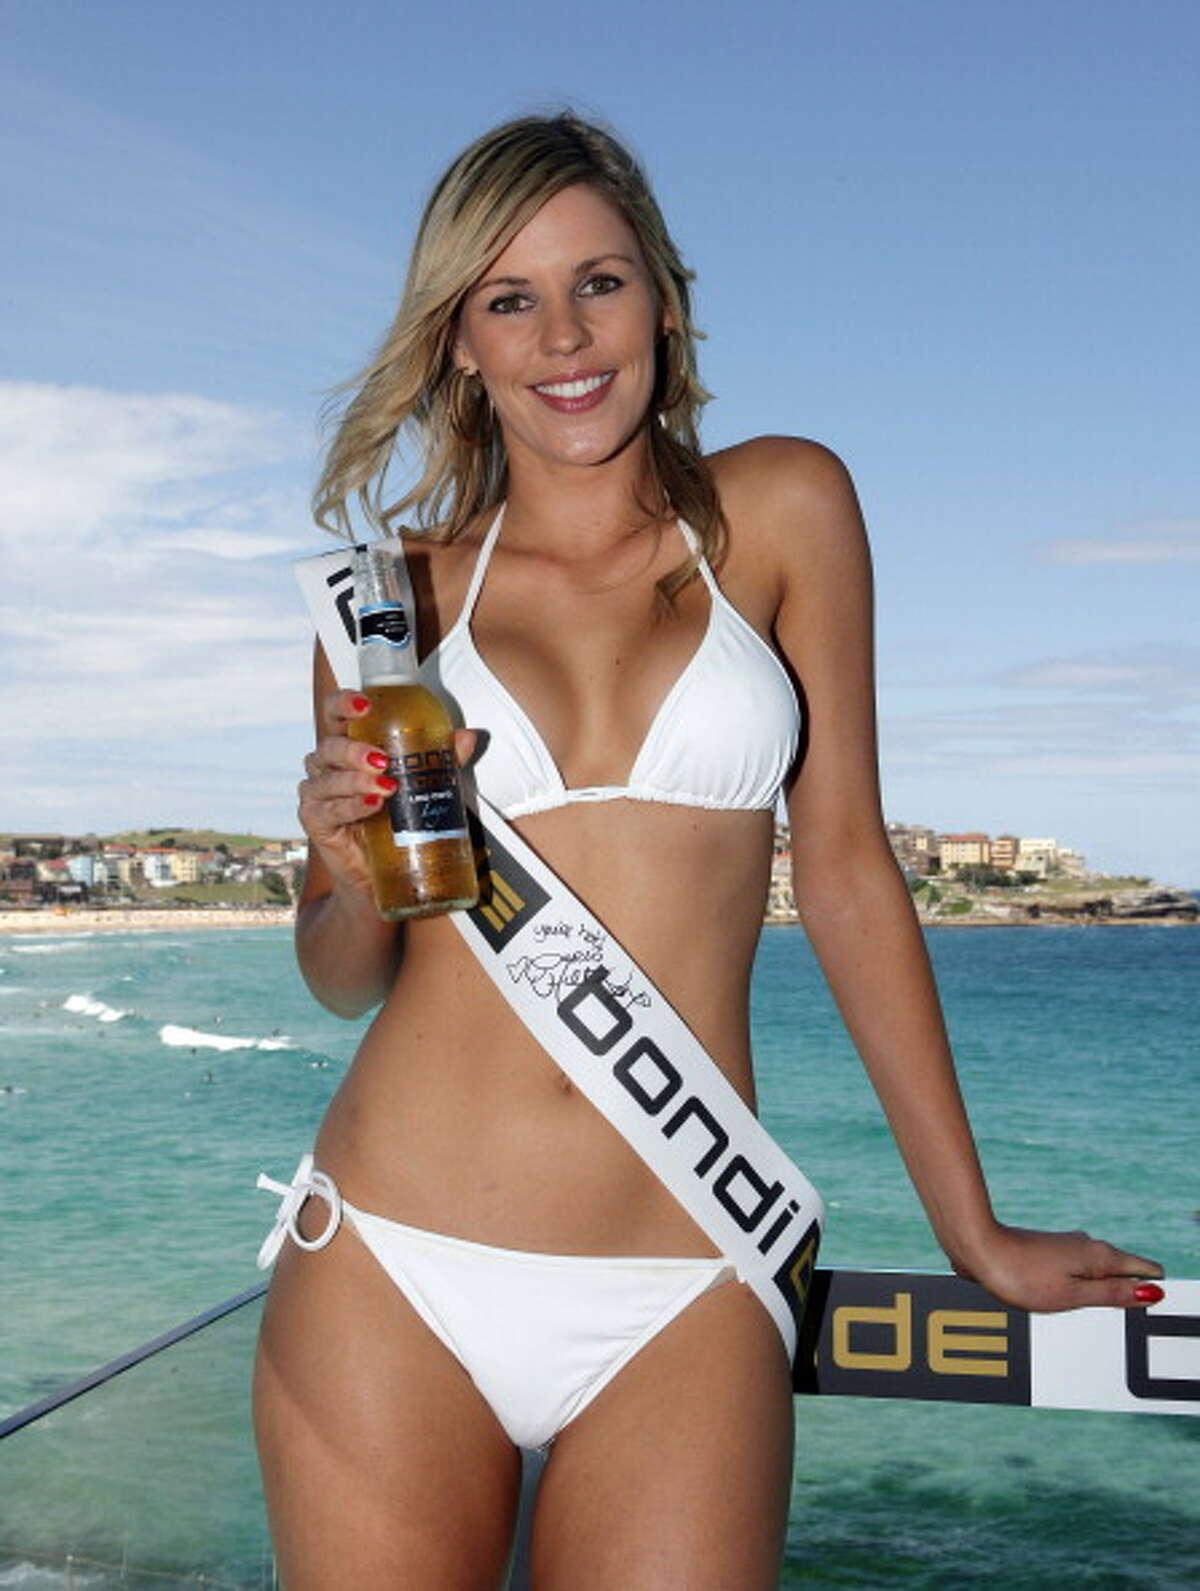 Jamie Wright, winner during Paris Hilton Launches Bondi Blonde Beer at Bondi Icebergs in Sydney, NSW, Australia. (Photo by Don Arnold/FilmMagic)